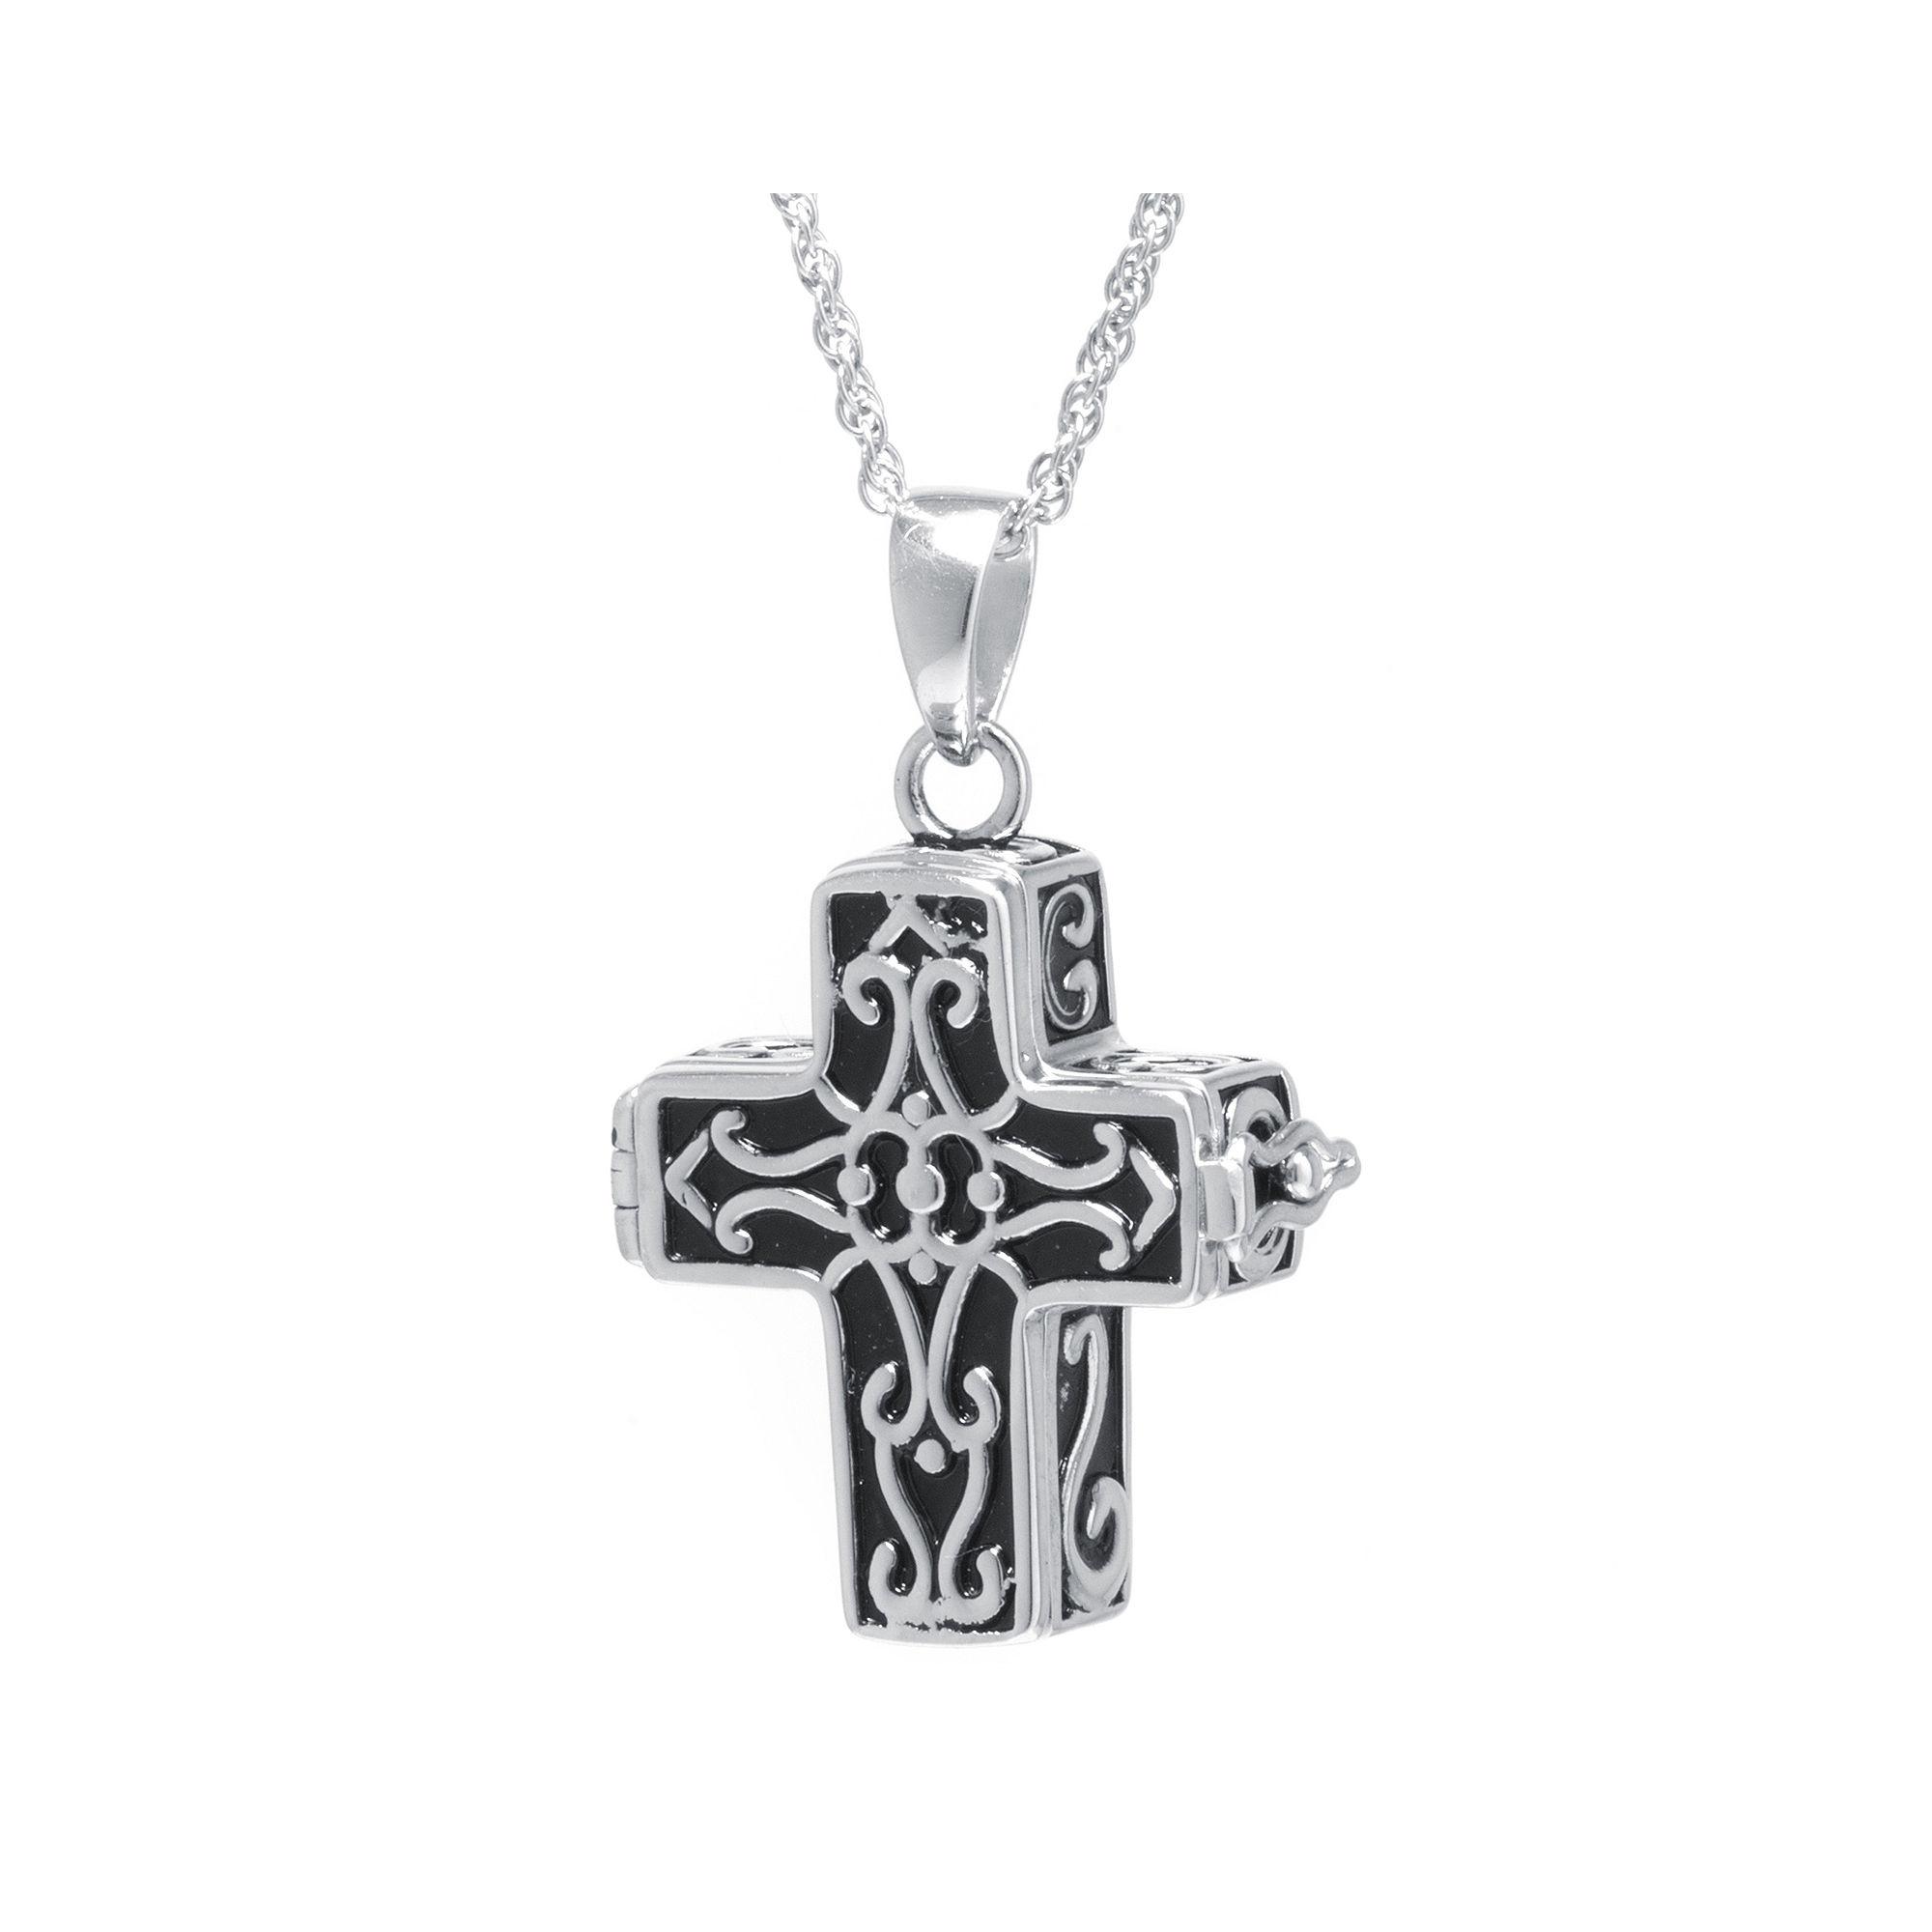 Sterling Silver Vintage Cross Prayer Pendant Necklace